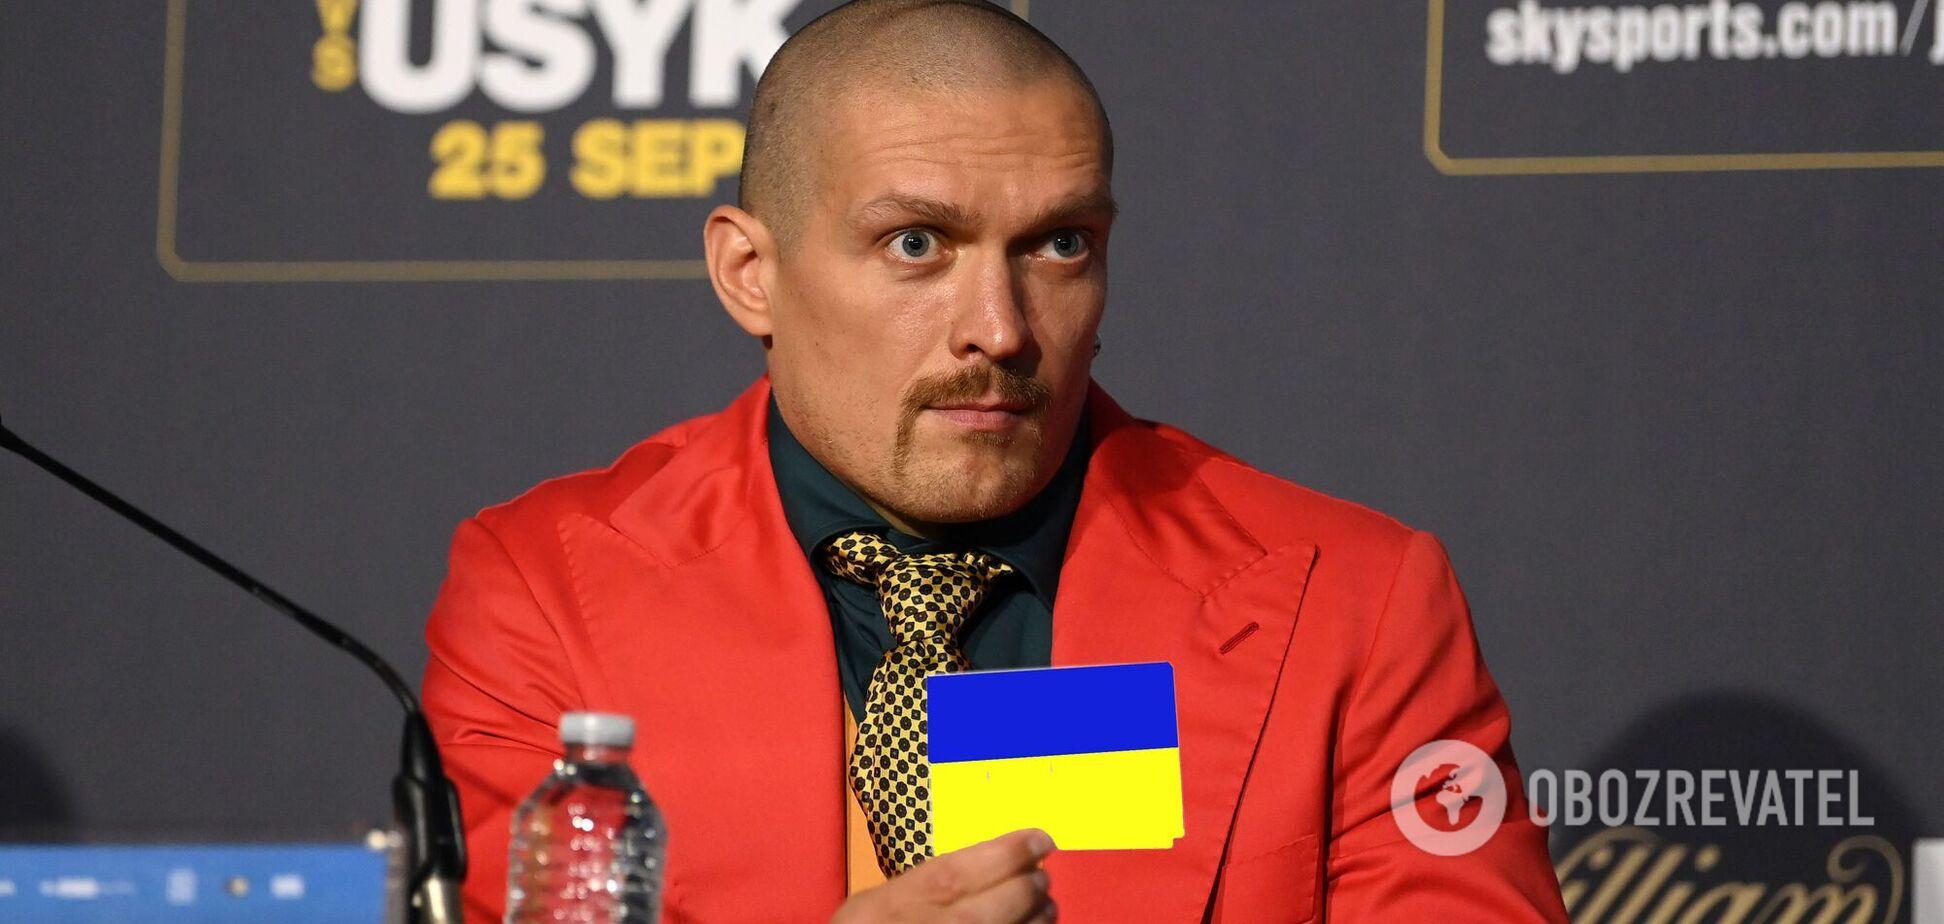 Александр Усик флаг Украины